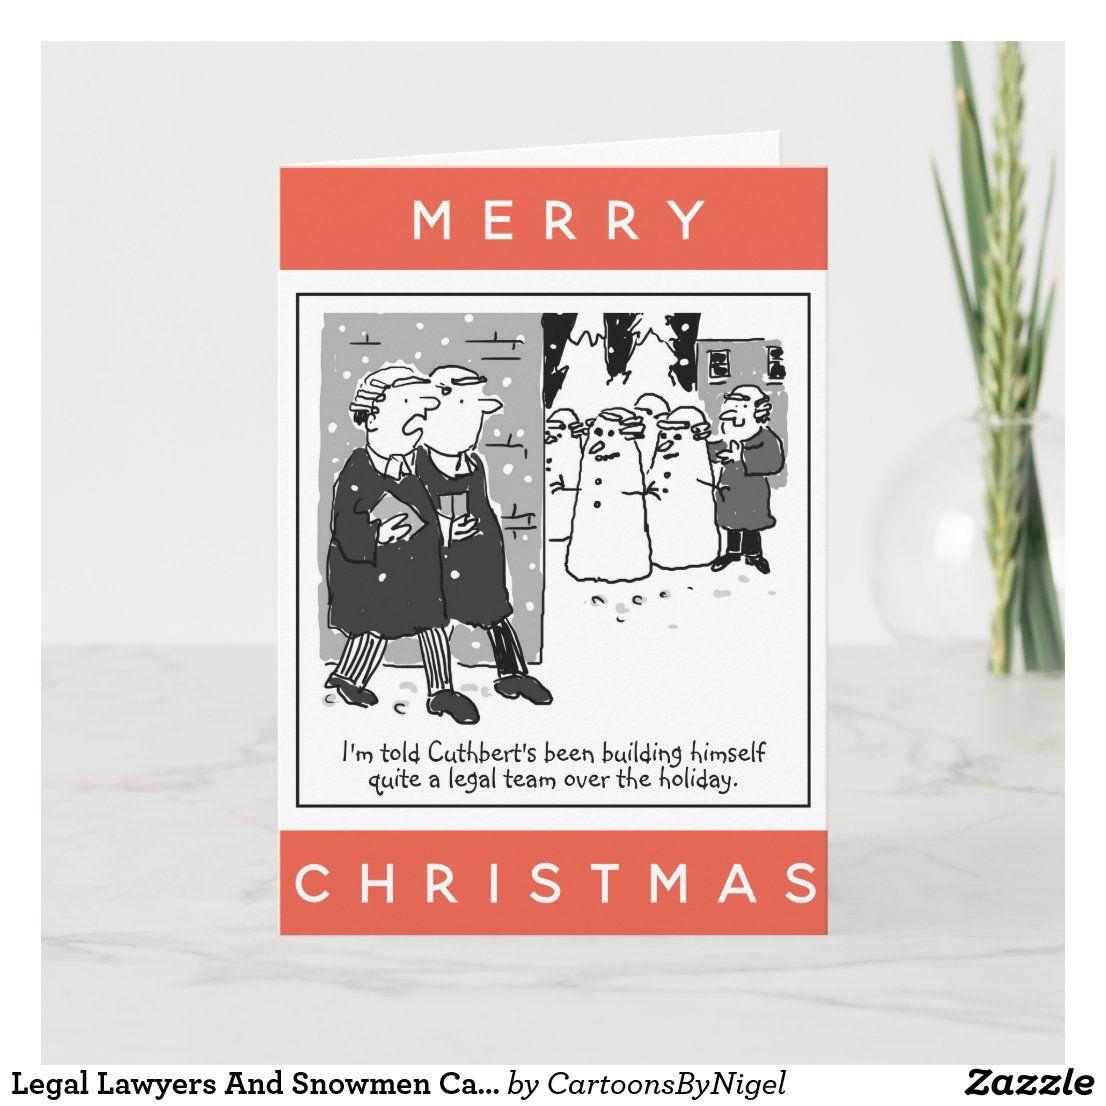 Legal Lawyers And Snowmen Cartoon Christmas Card Zazzle Co Uk Snowman Cartoon Christmas Cards Funny Christmas Cards